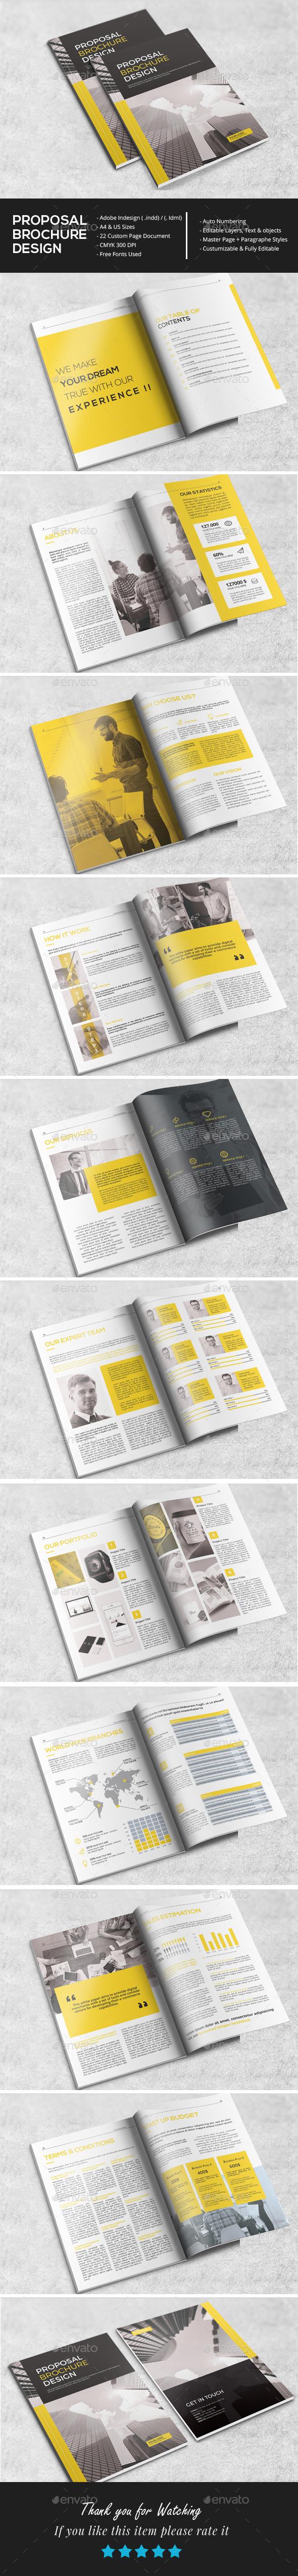 Stylish Proposal Brochure Design - Brochures Print Templates